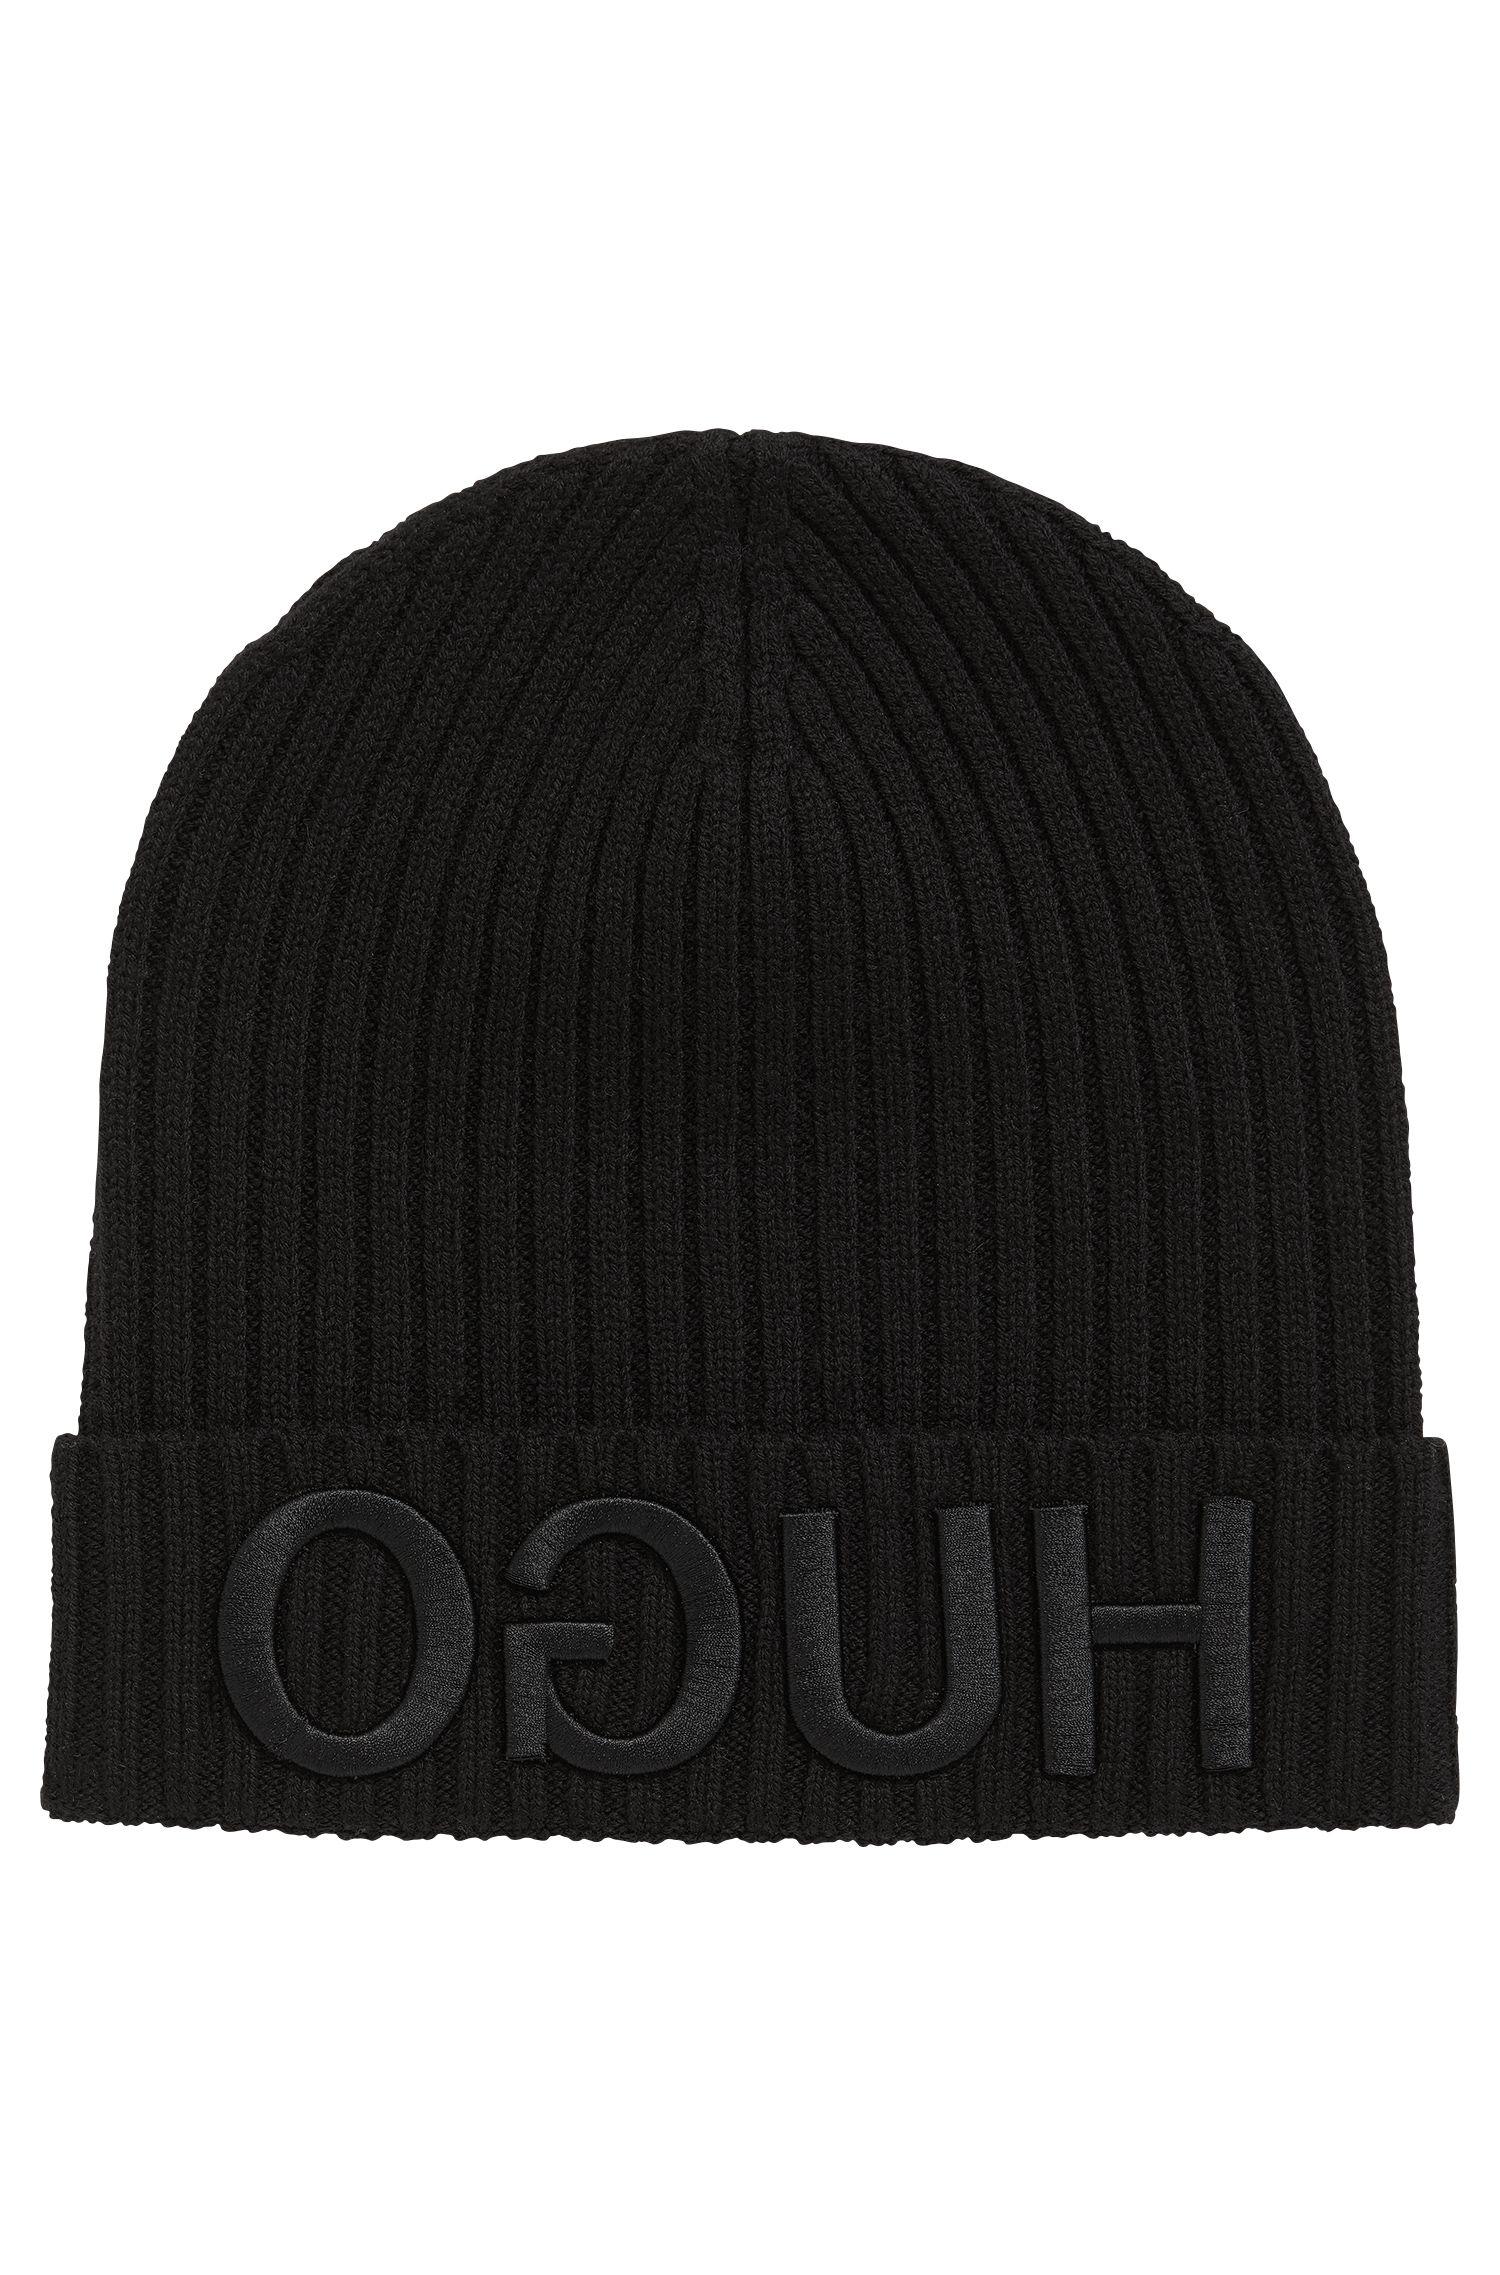 Logo Wool Beanie | Men X, Black